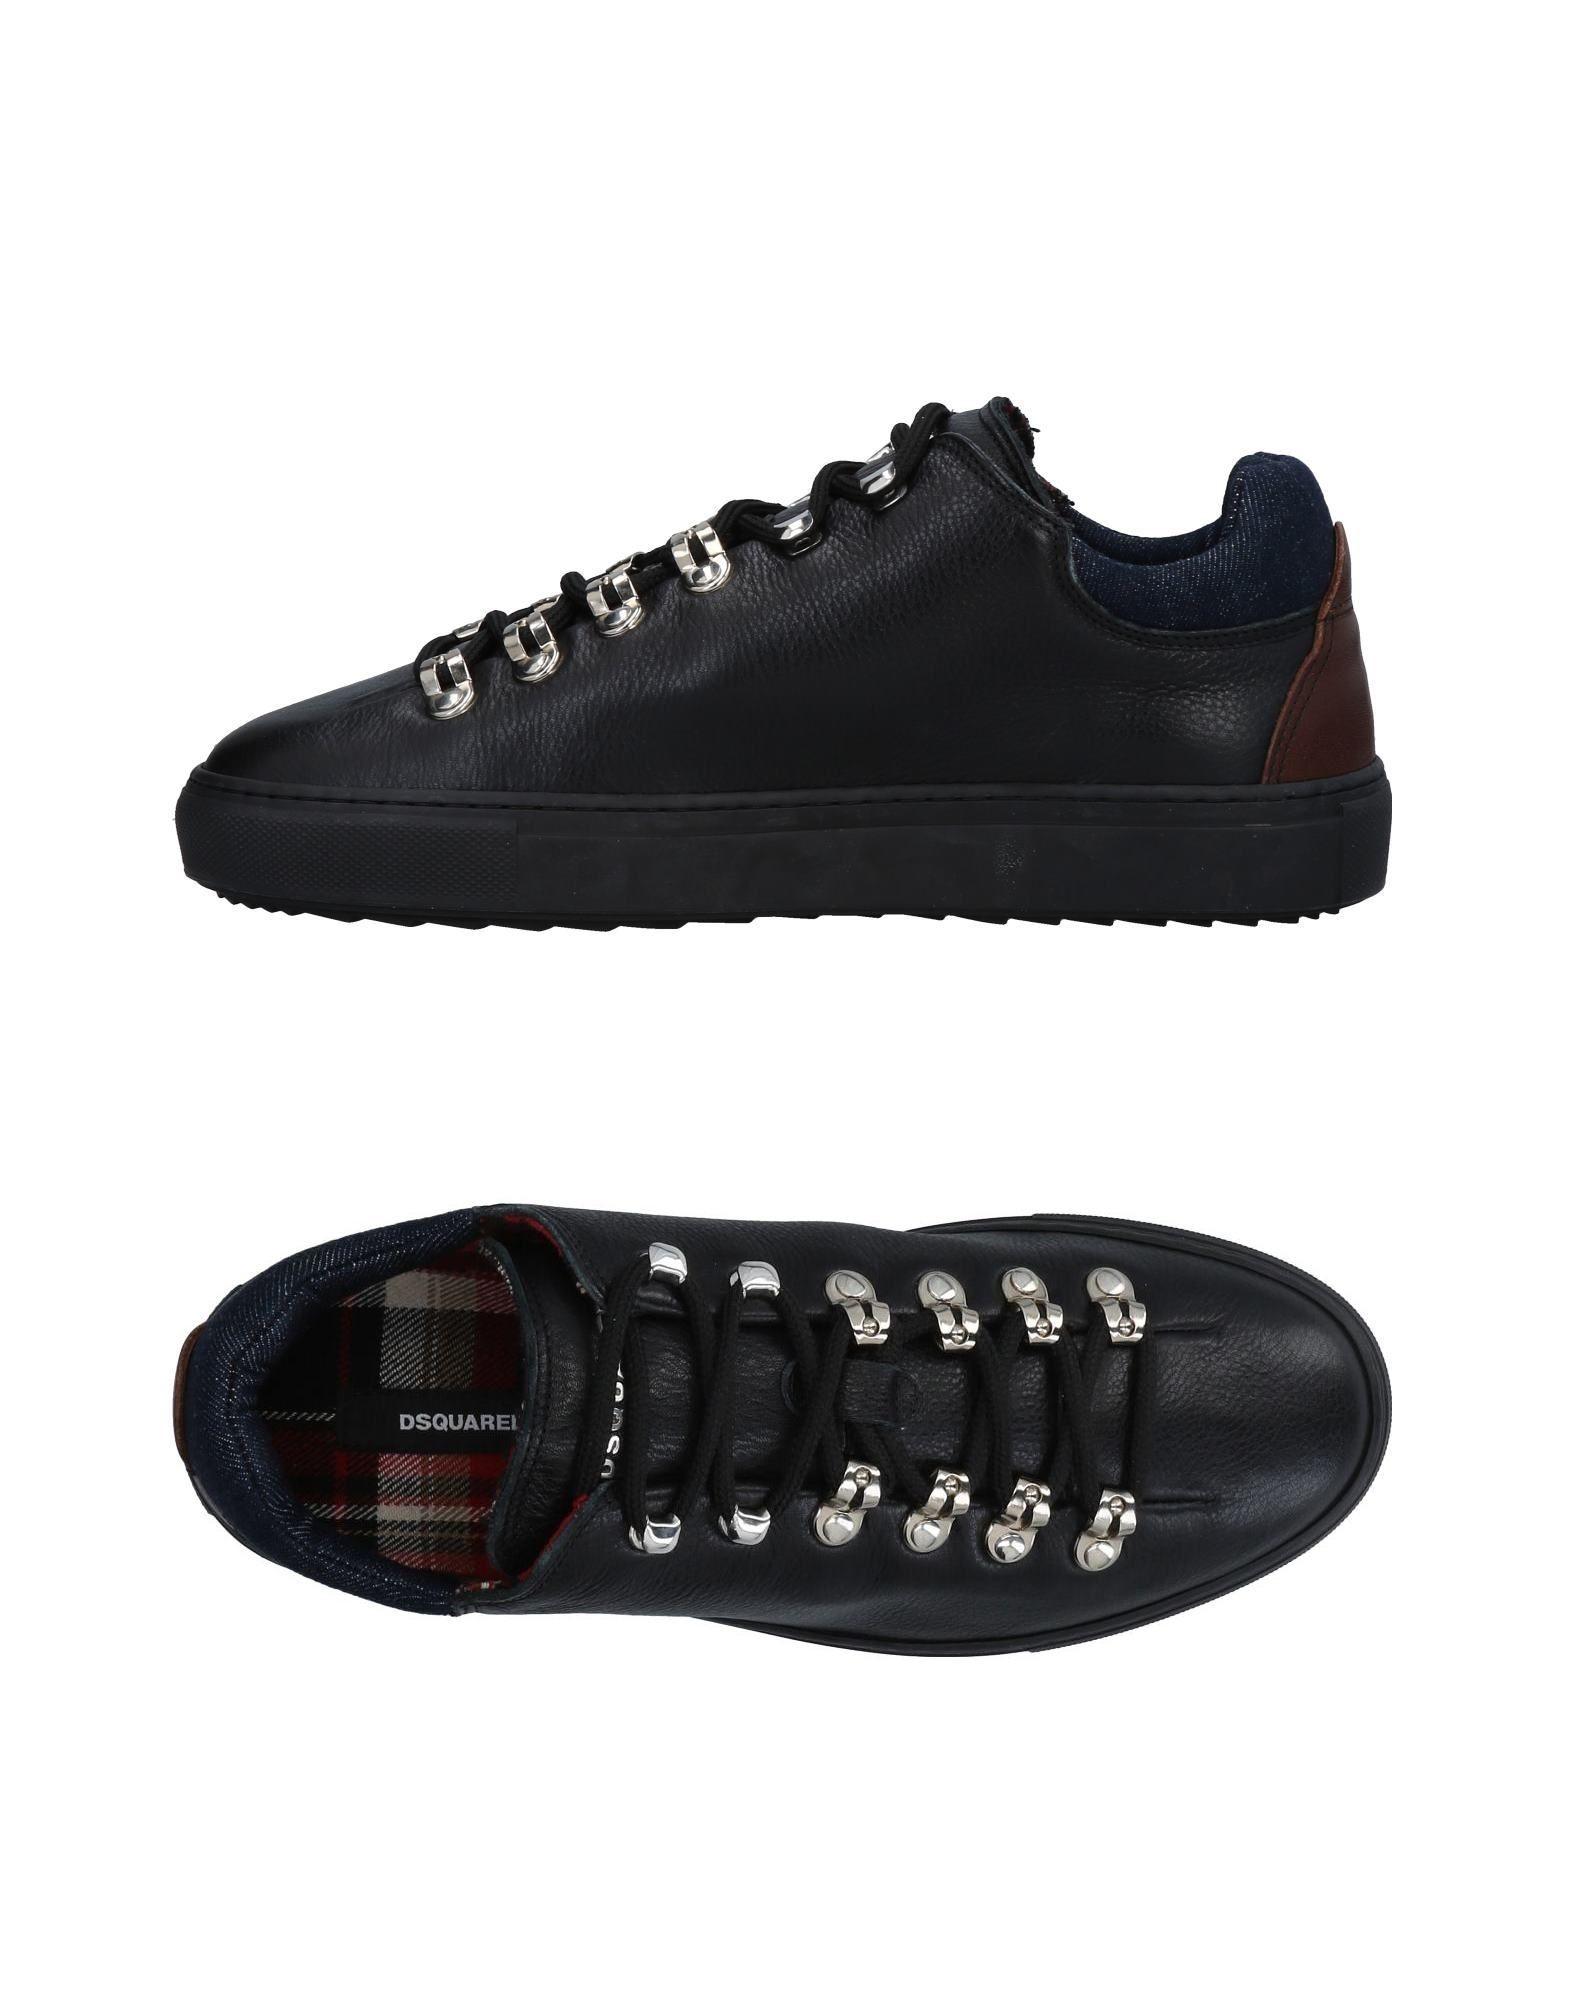 Dsquared2 Sneakers Herren  11485420BU Gute Qualität beliebte Schuhe